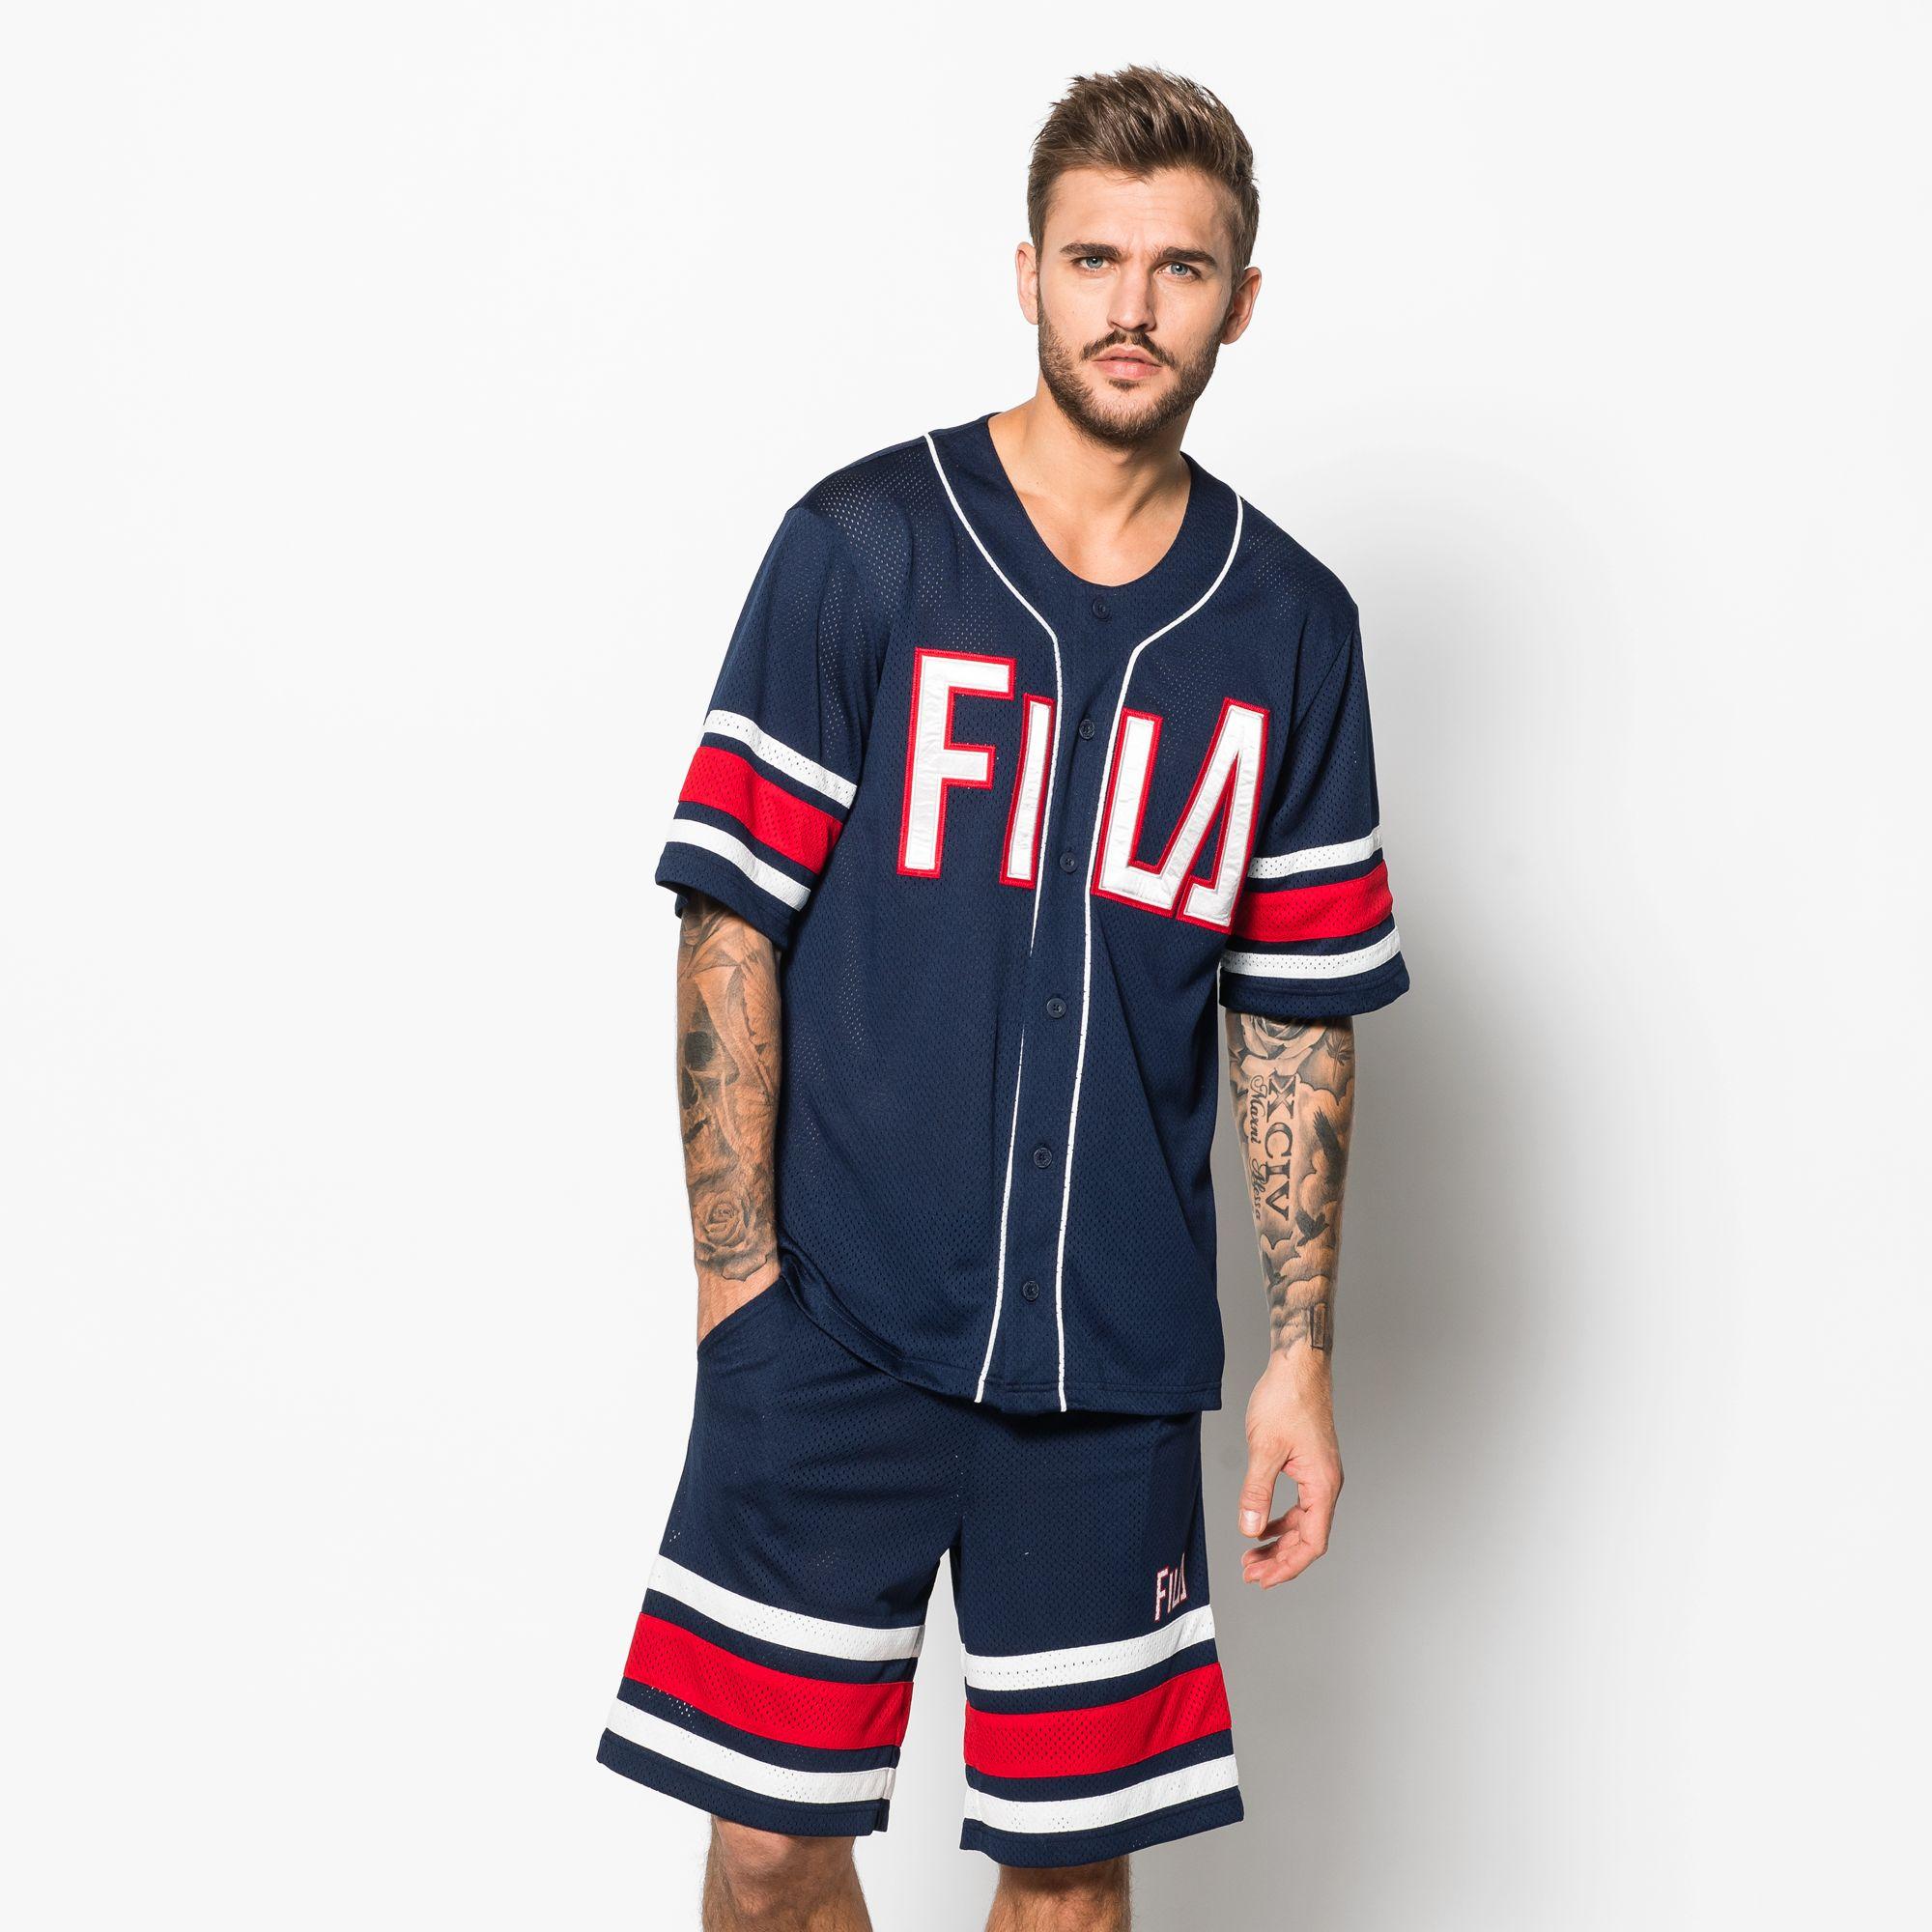 Kyler Baseball Jersey